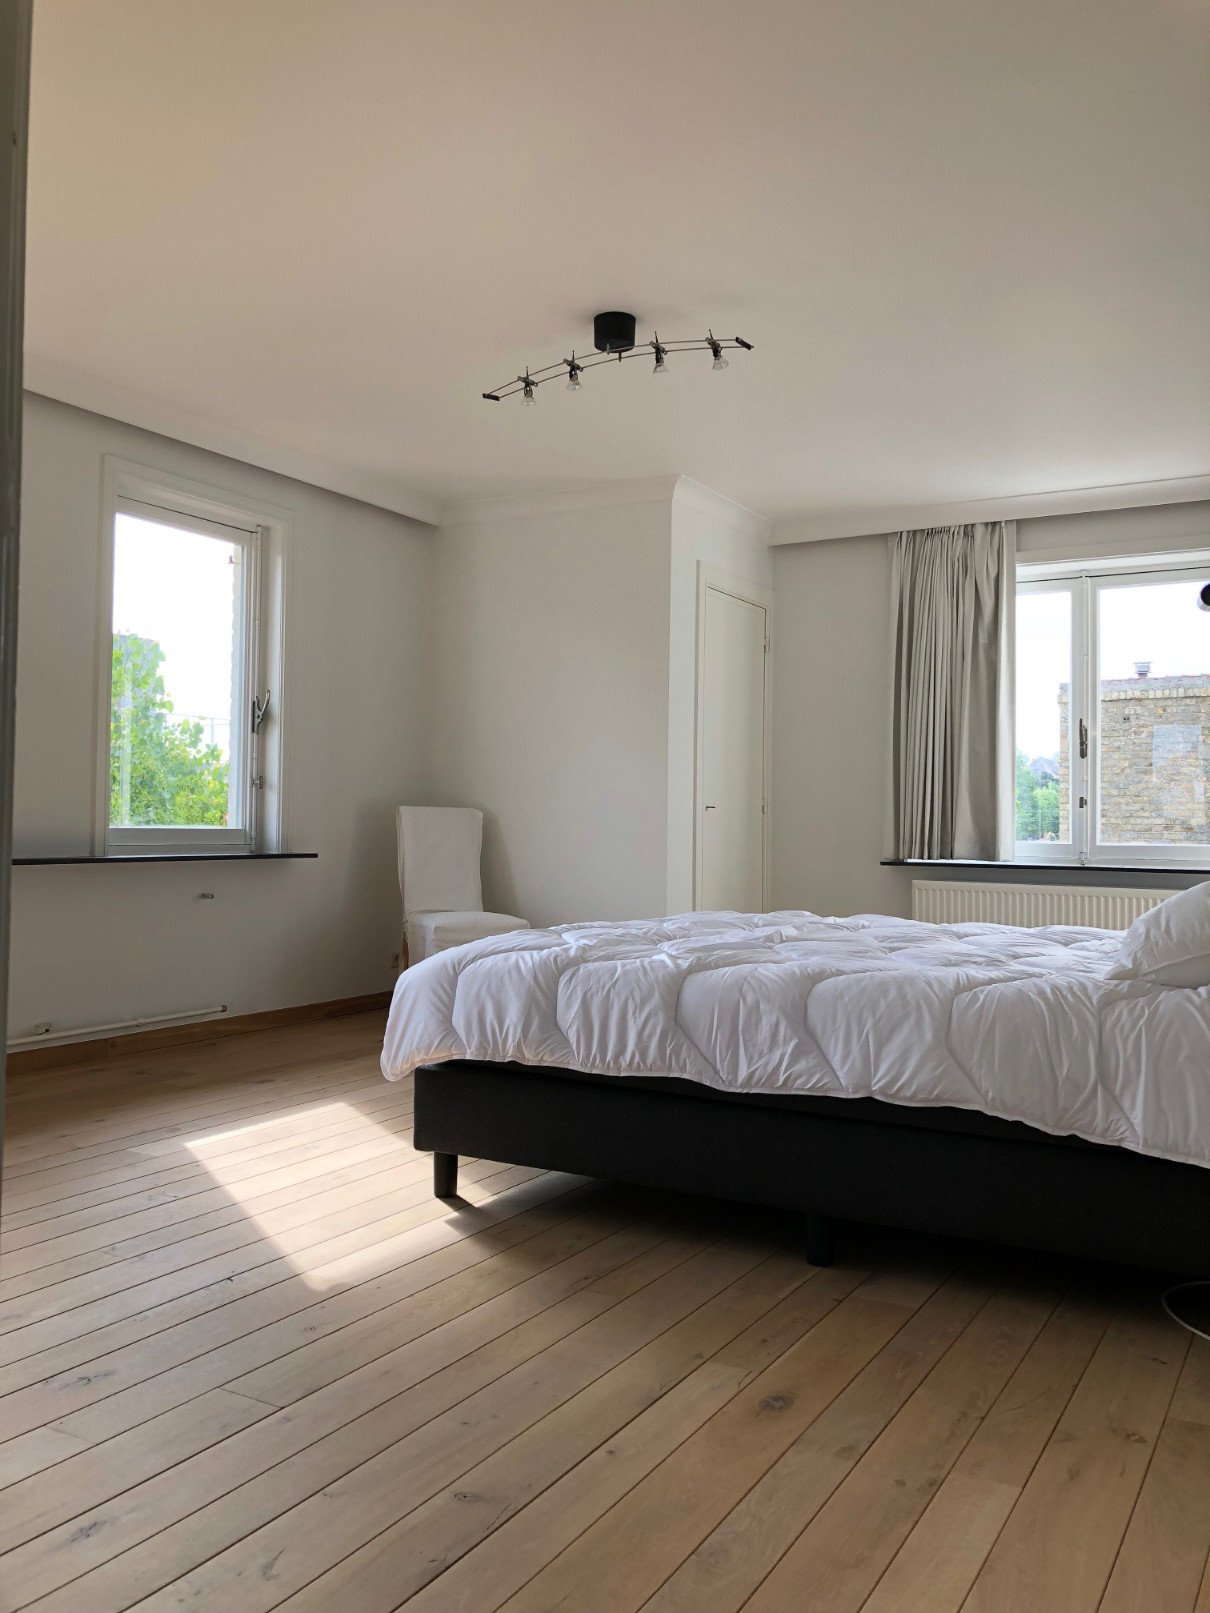 Rietveldprojects-Villa Were Di - Te Koop : Te Huur (per week)11.jpg